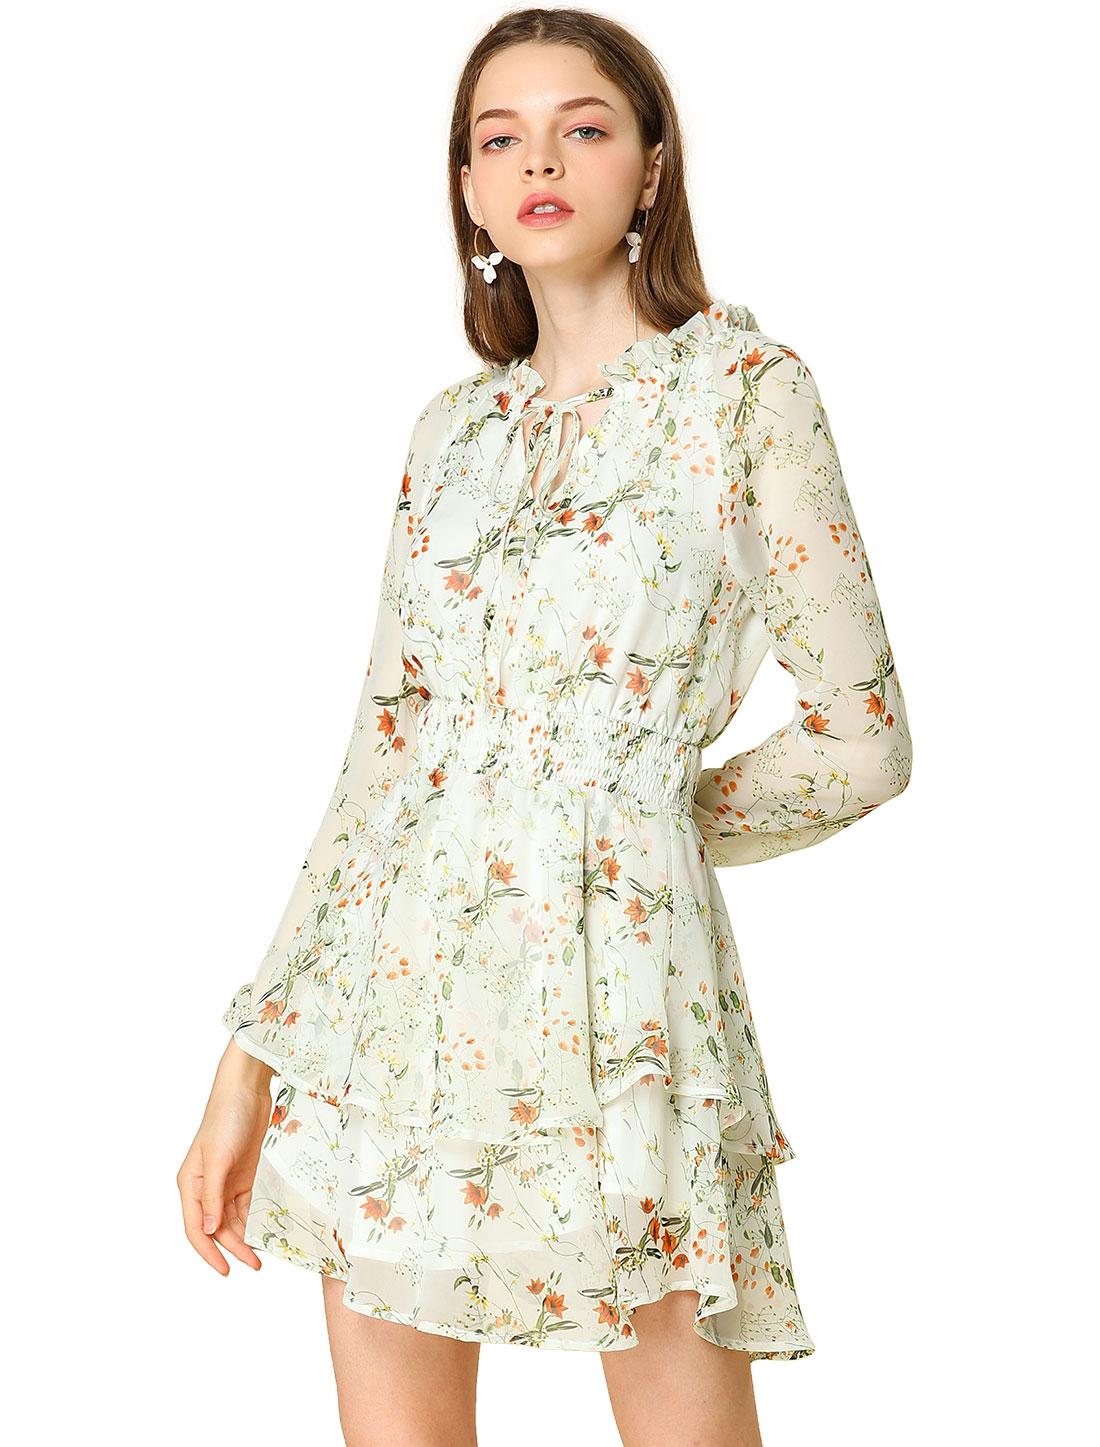 Allegra K Women's Floral Smocked Waist Chiffon Dress White S